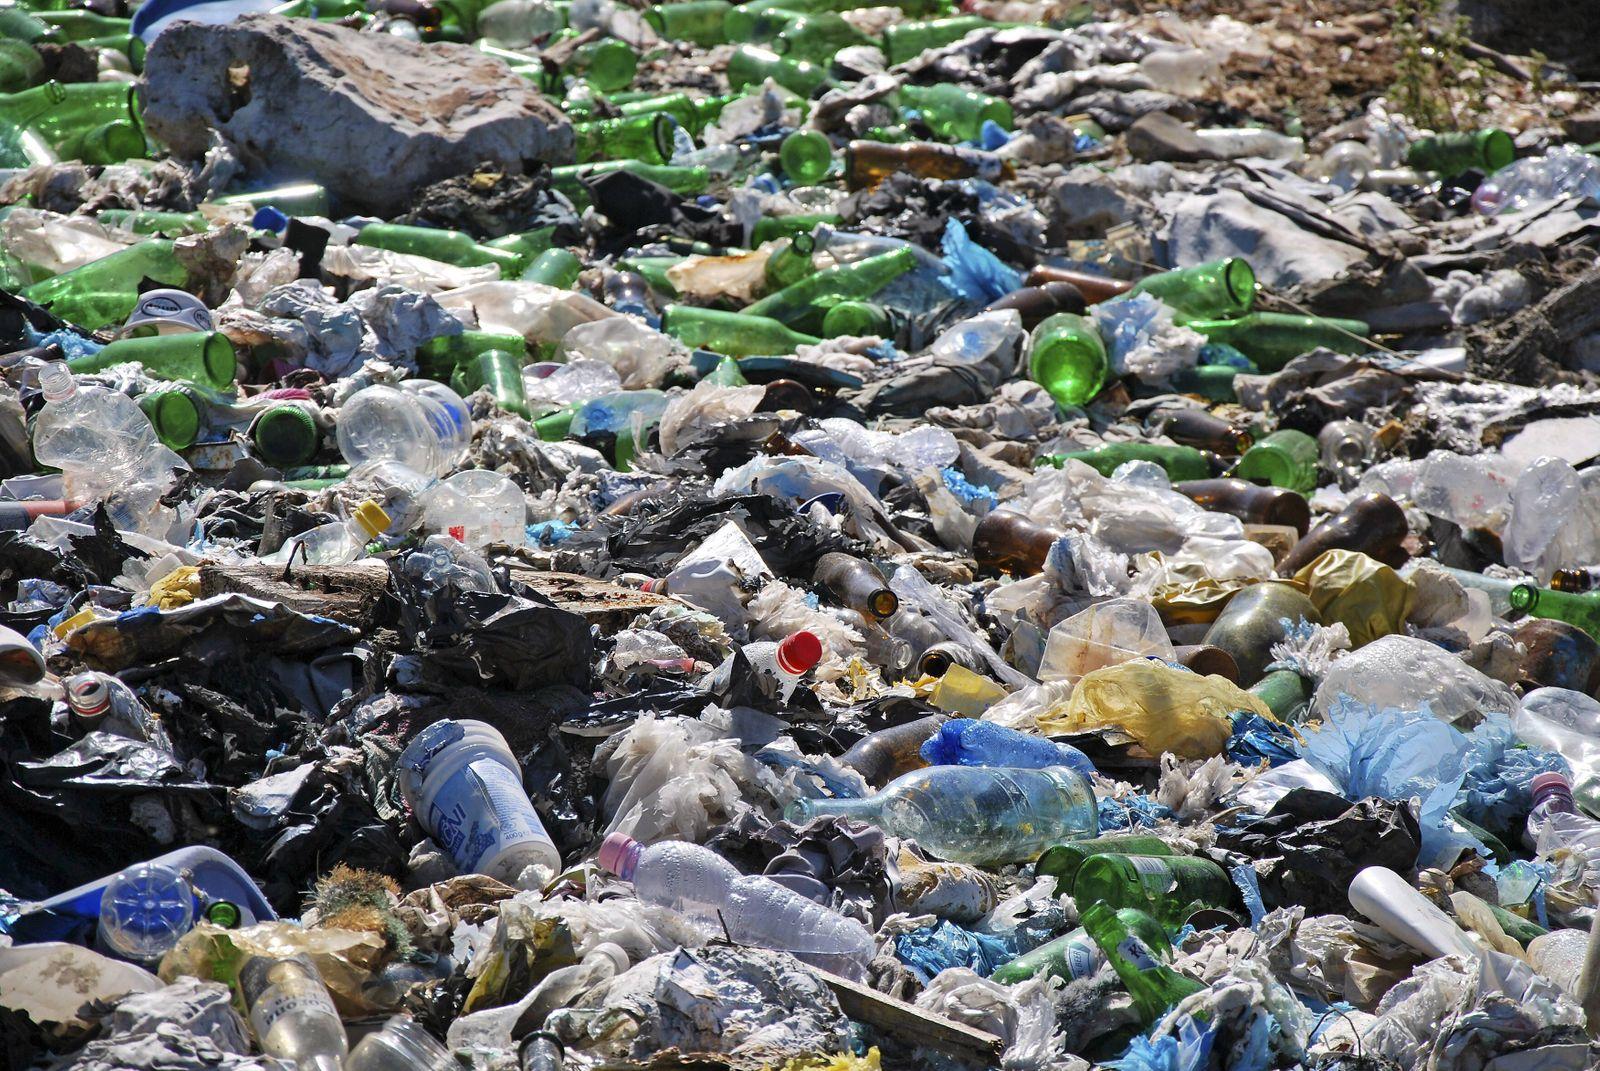 Müllhalde, Plastikmüll *** garbage dump, plastic garbage PUBLICATIONxINxGERxSUIxAUTxHUNxONLY 040442NE